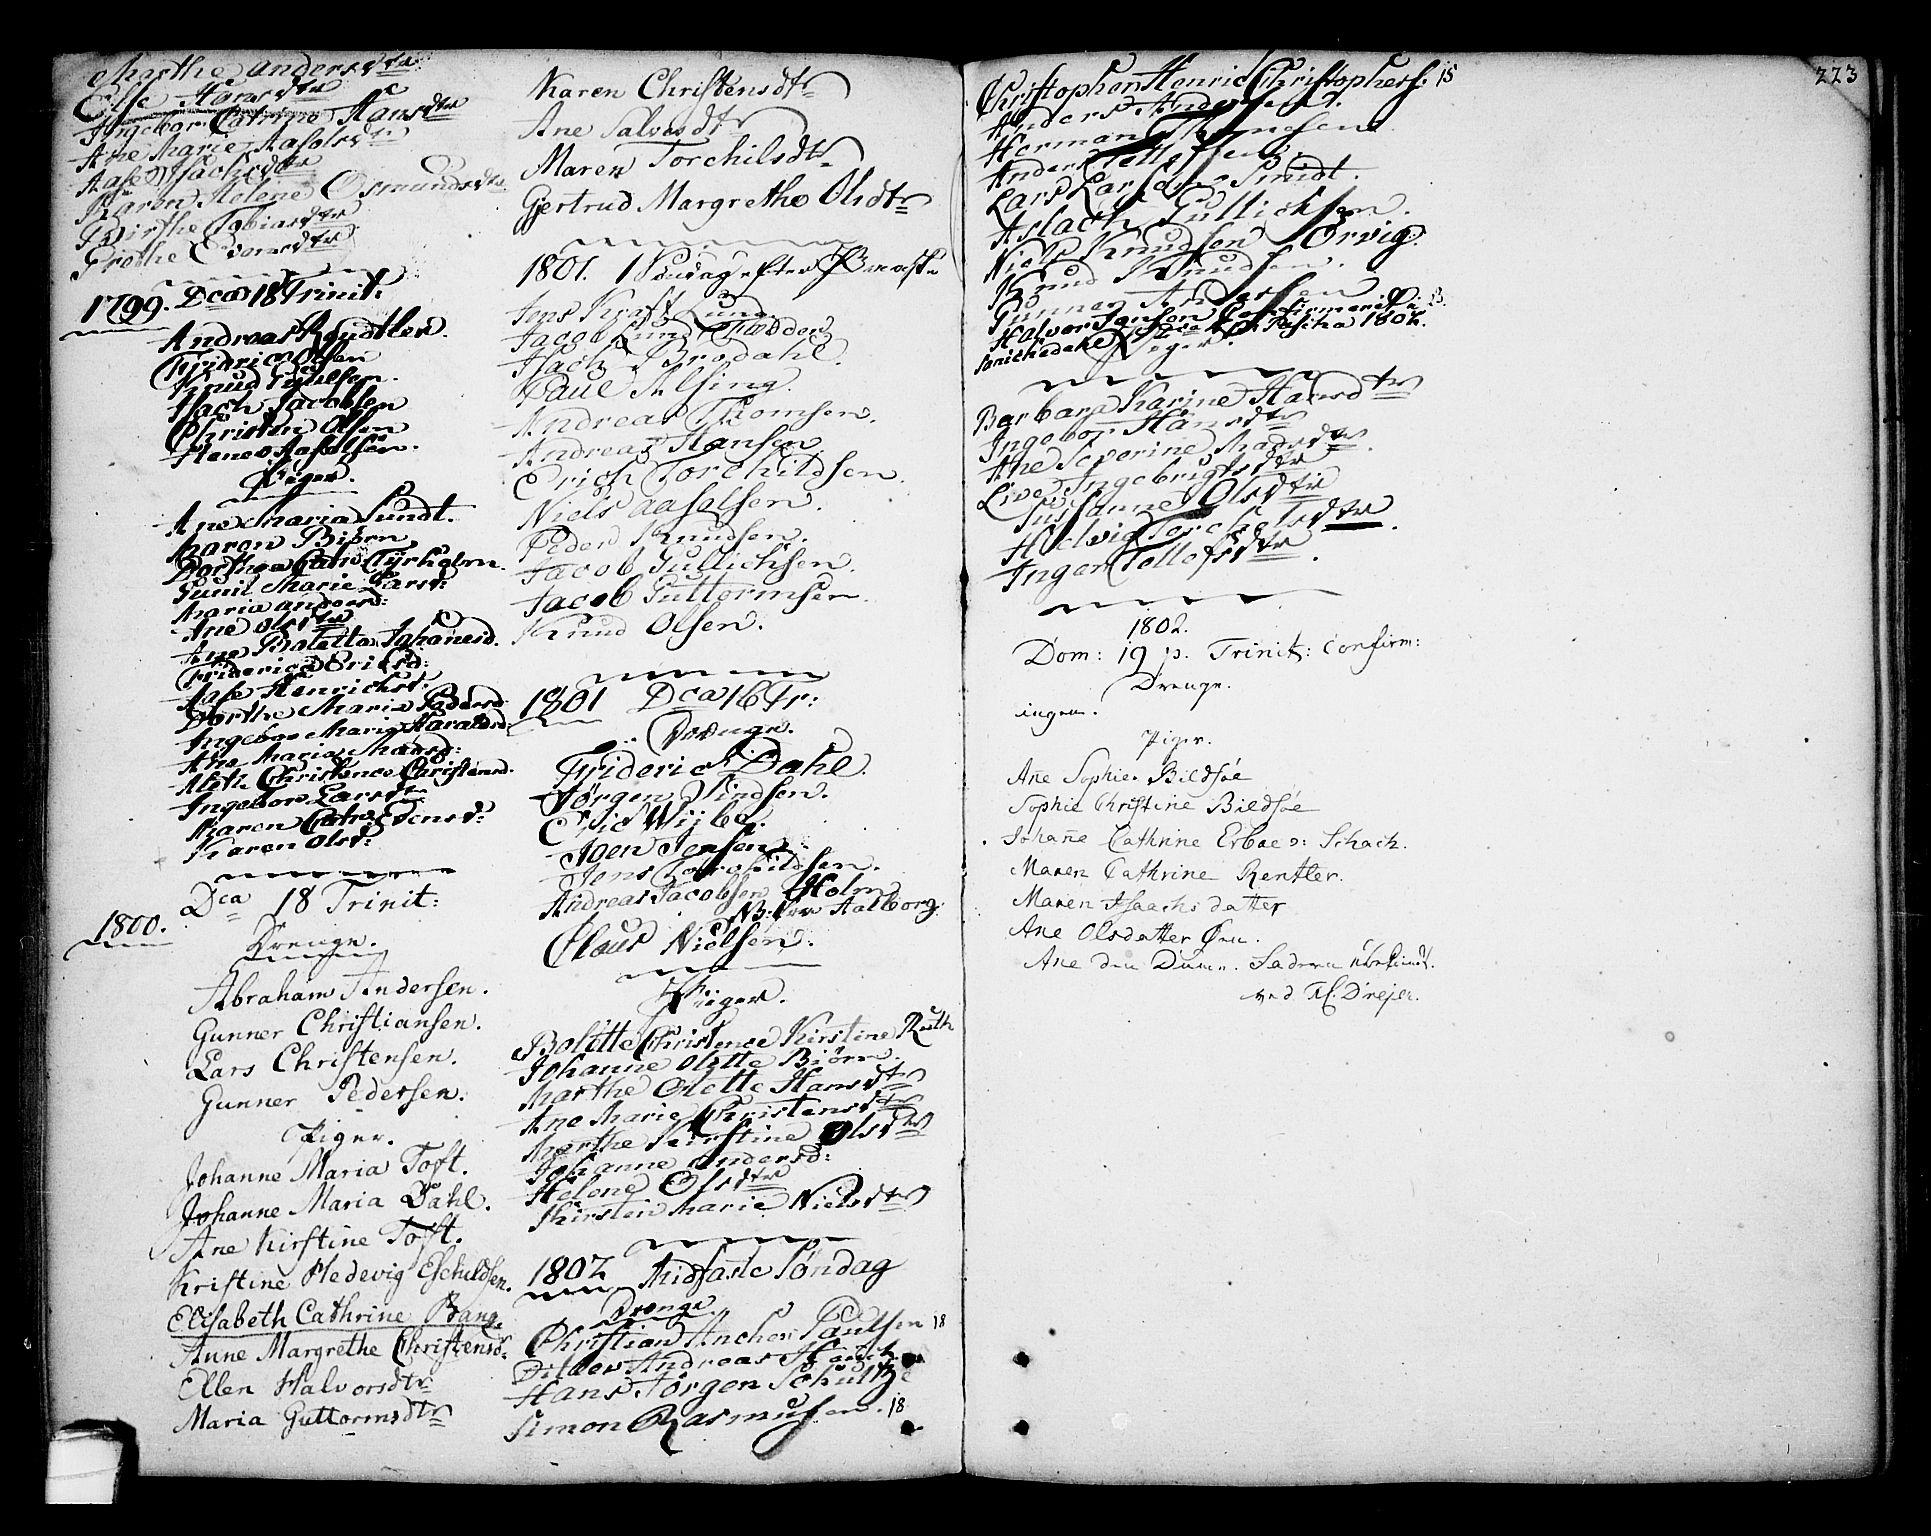 SAKO, Kragerø kirkebøker, F/Fa/L0002: Ministerialbok nr. 2, 1767-1802, s. 223